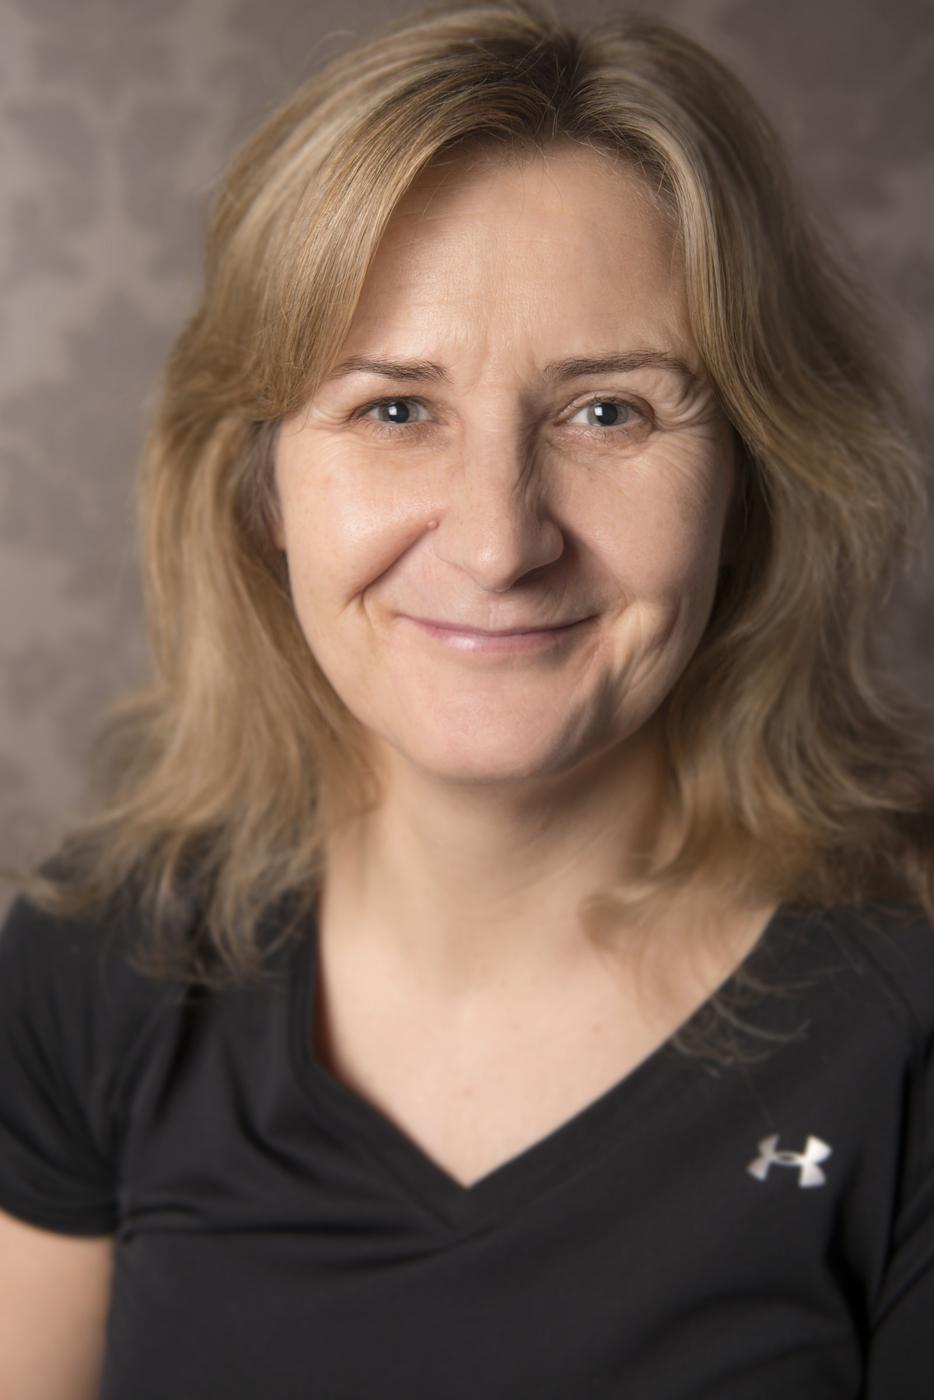 Karenanne Hay, Reiki Master Teacher